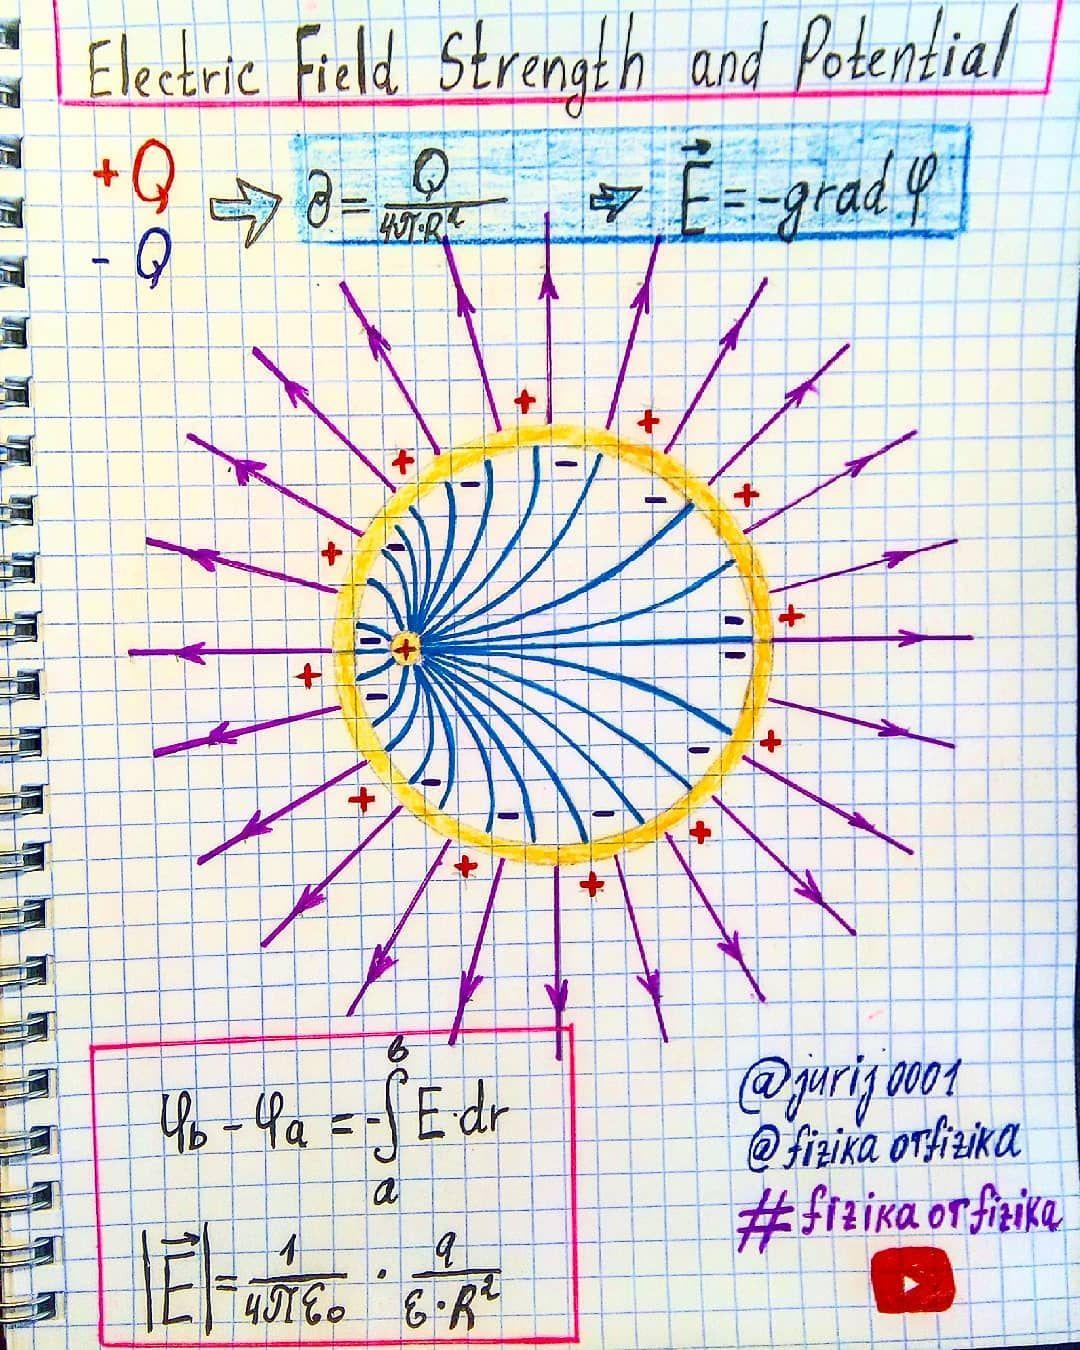 Pin By Filip Szpaczek On Art Notatki Fizyka Nauka Matematyka